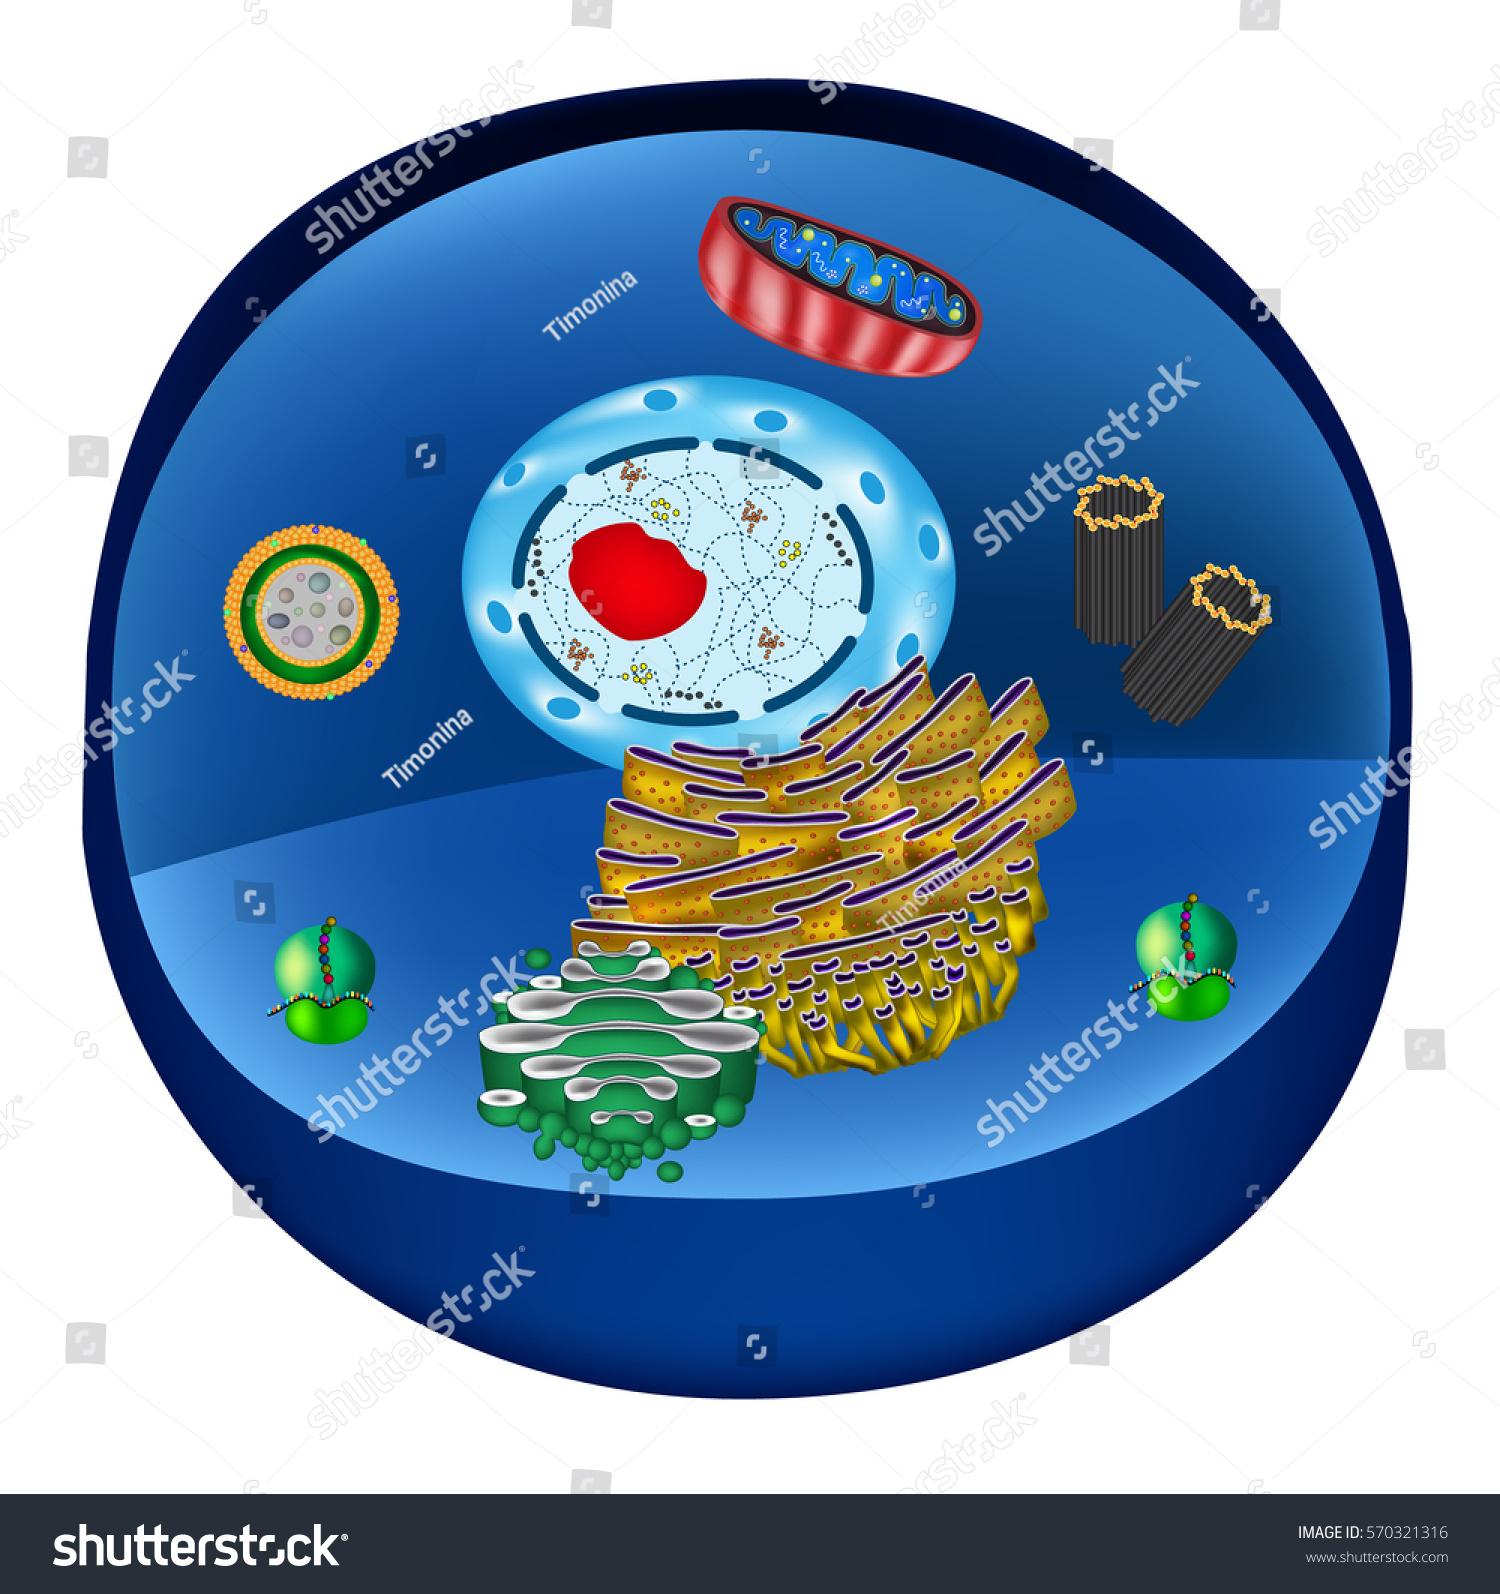 stock photo structure of human cells organelles the core nucleus endoplasmic reticulum golgi apparatus 570321316 structure human cells organelles core nucleus stock illustration